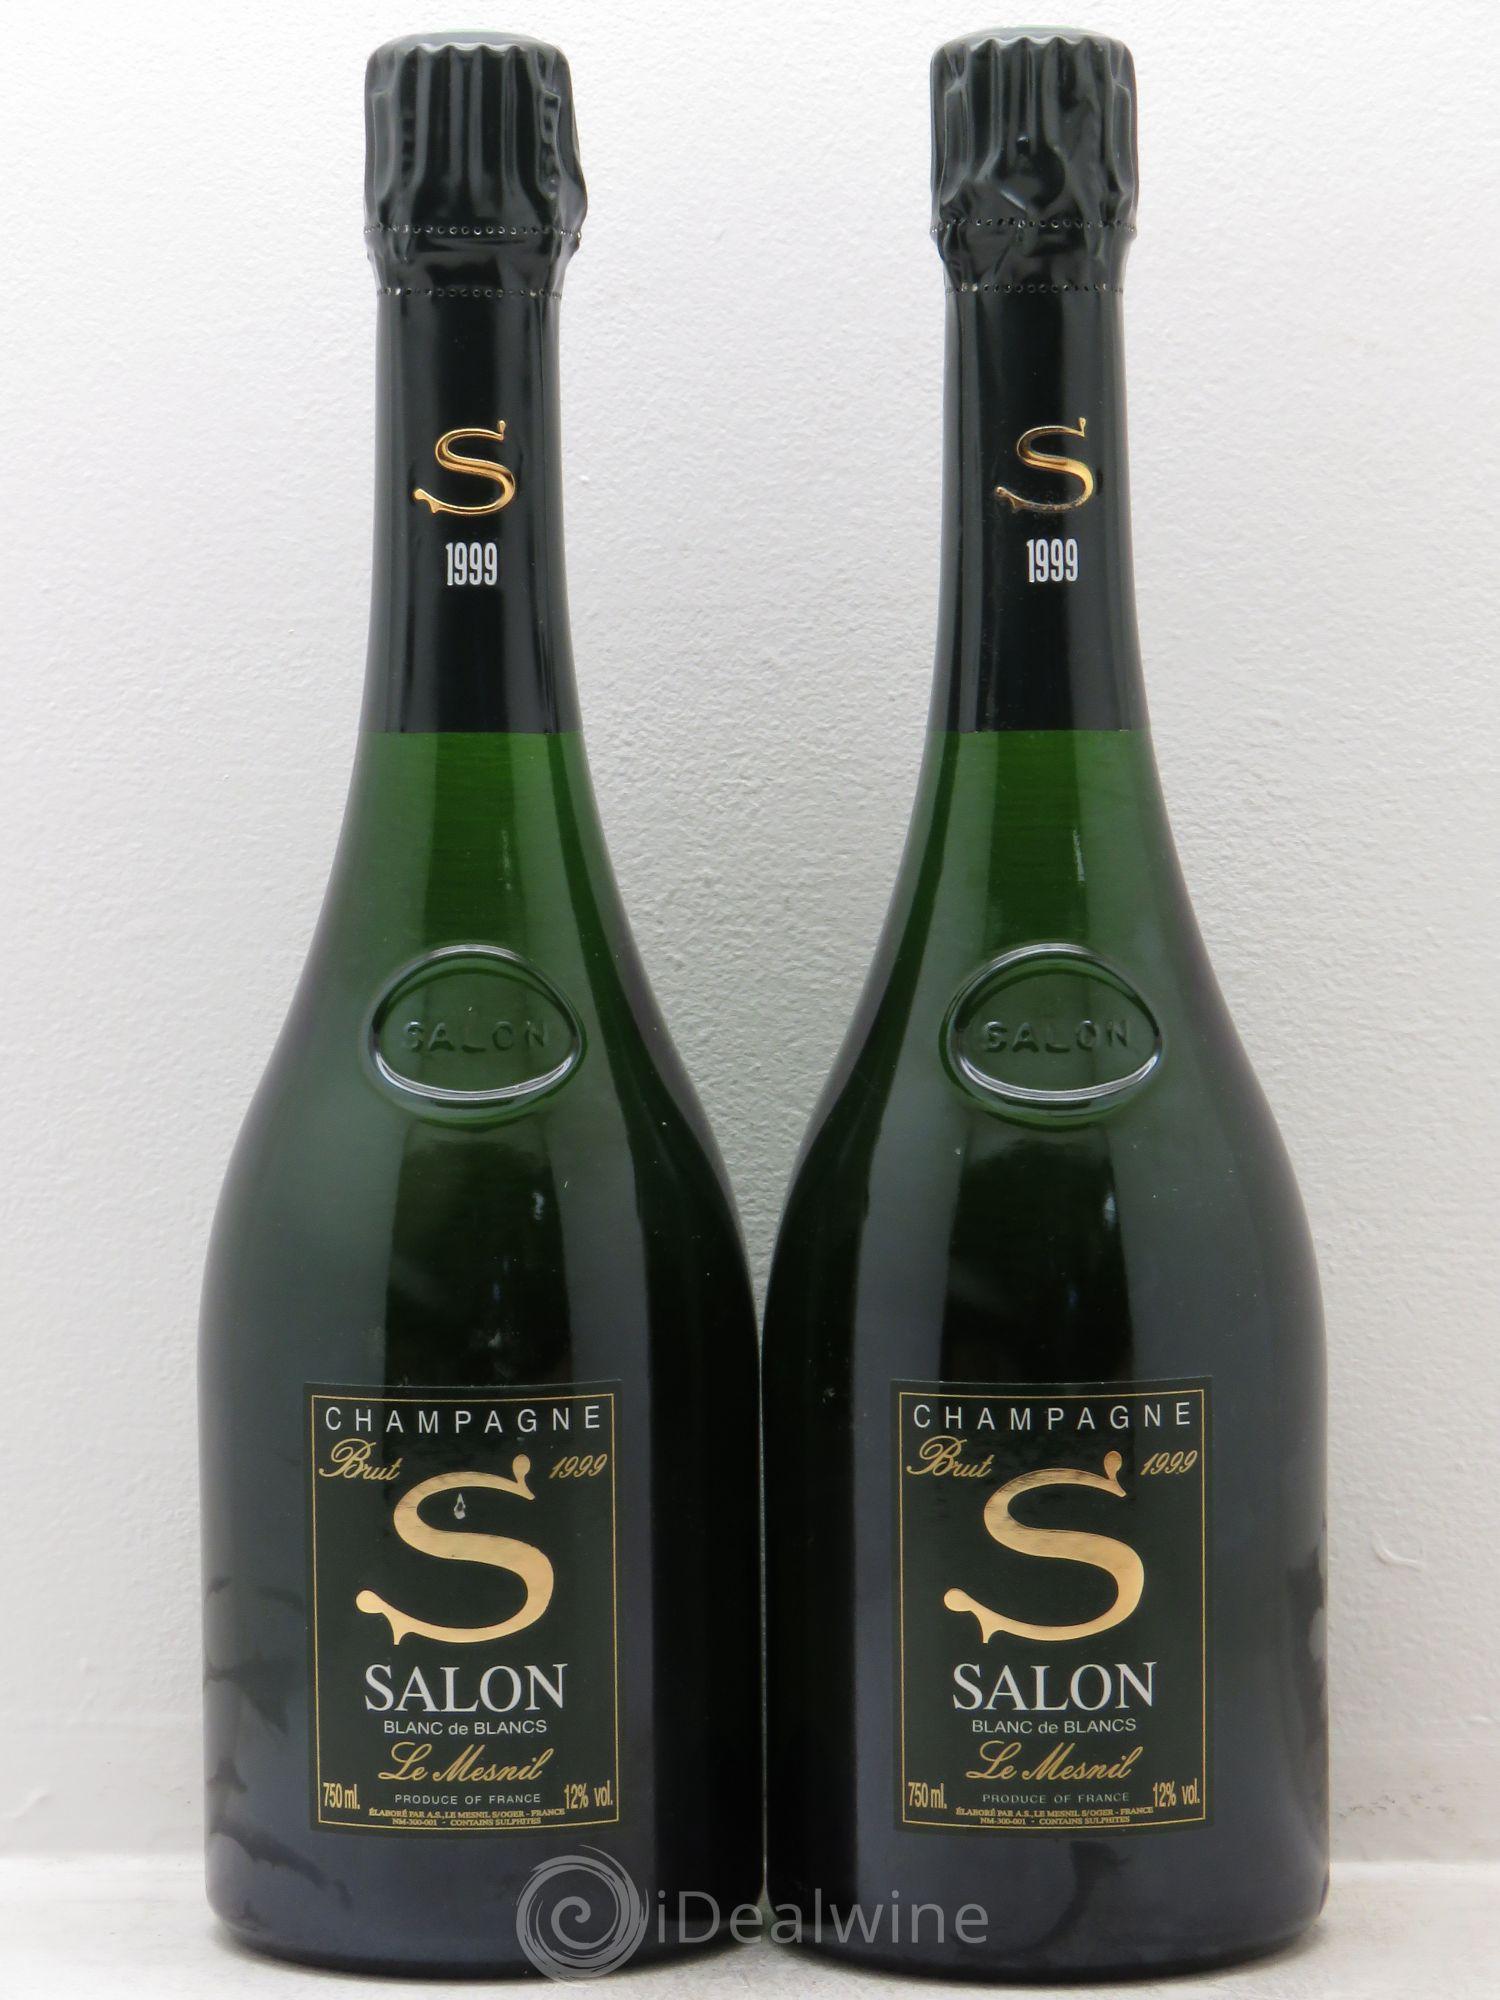 Cuvée S Salon 1999   Lot Of 2 Bottles